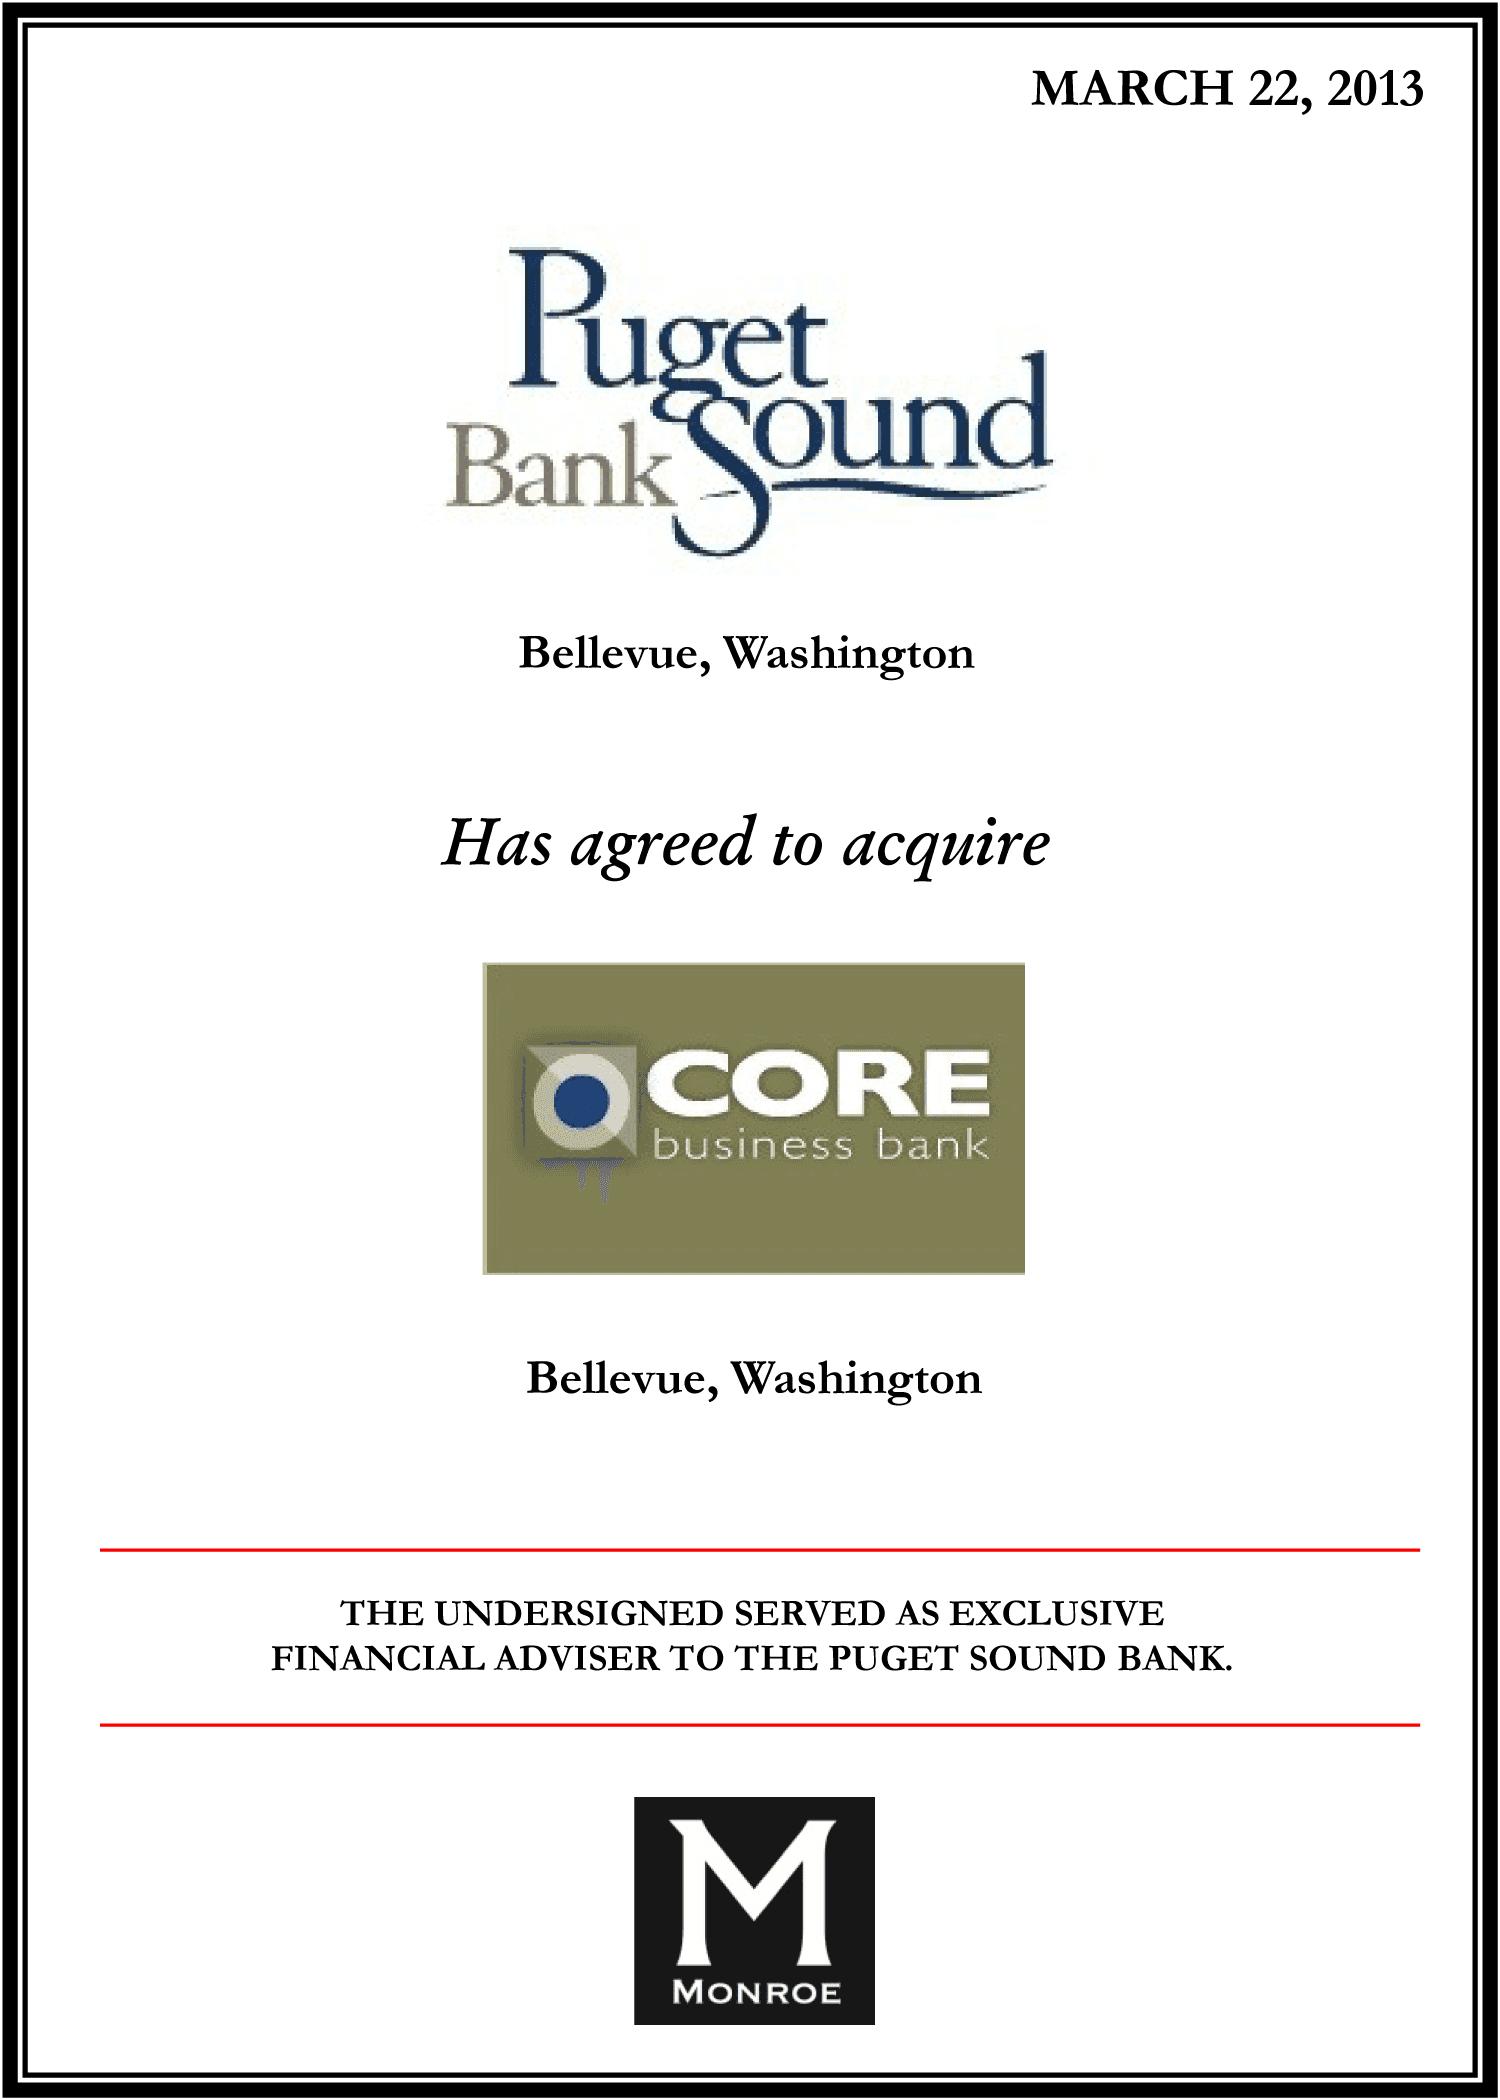 Puget-Sound-Tombstone-compressor.png